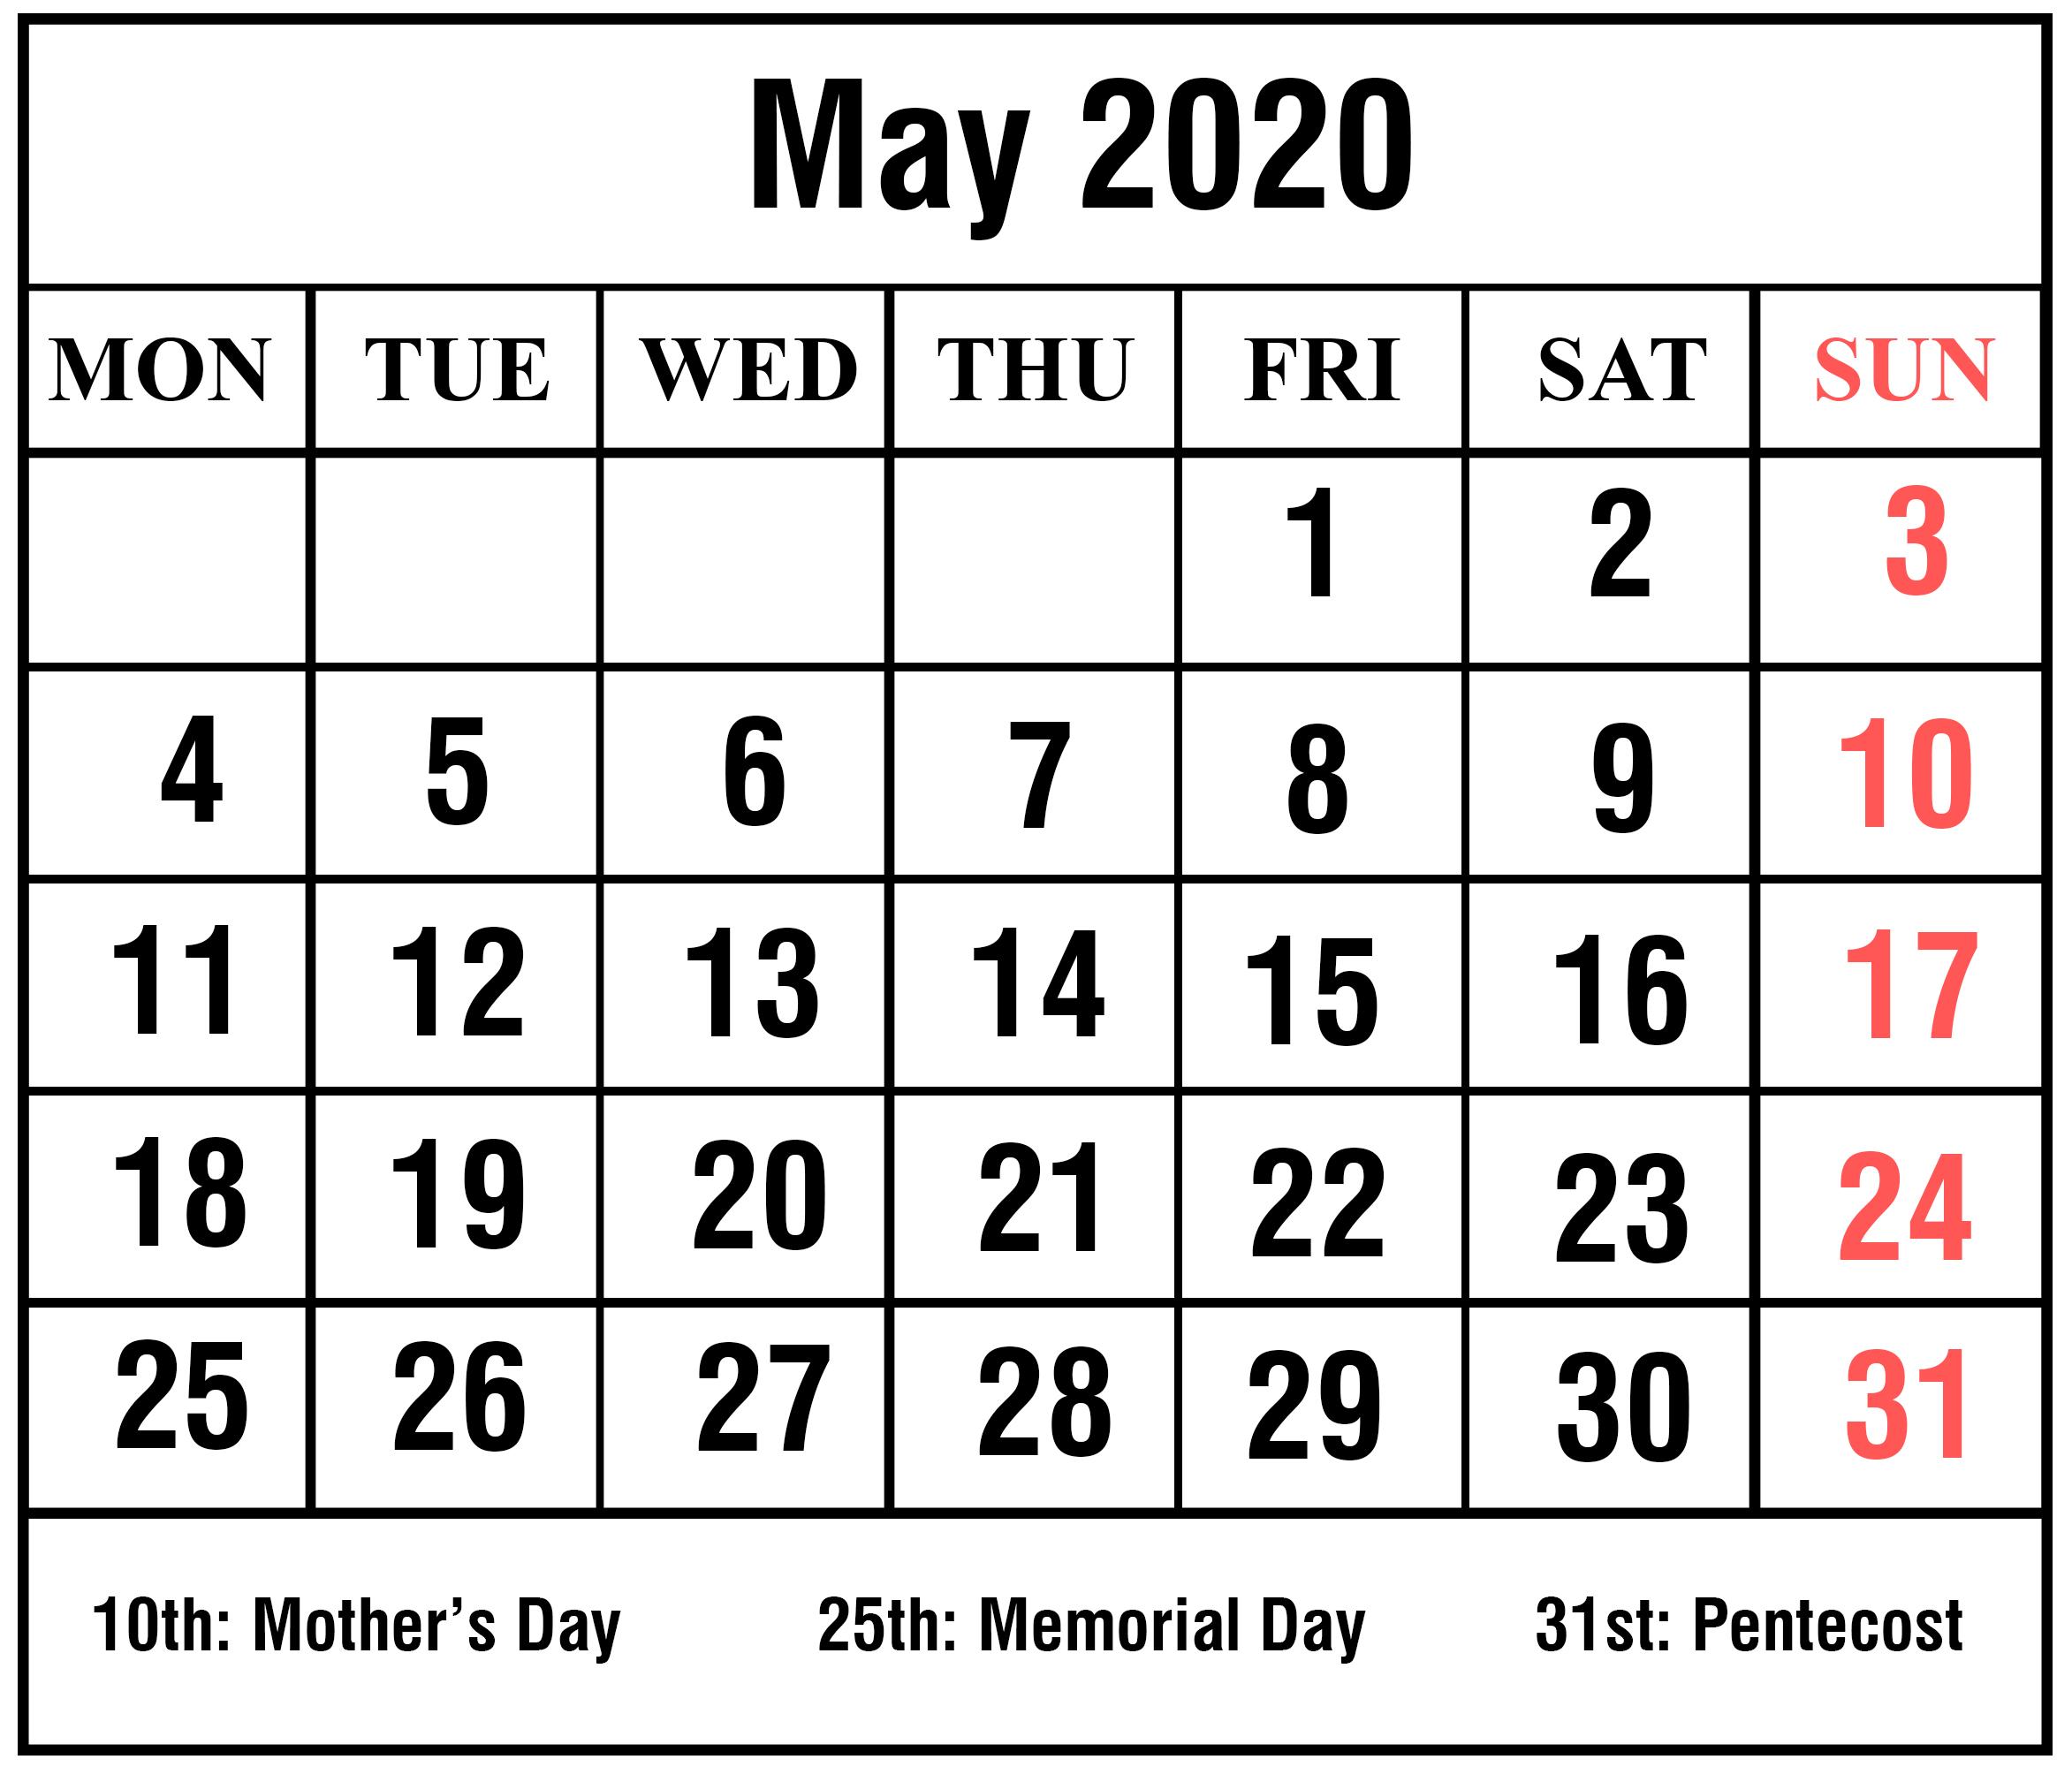 Free Blank May Calendar 2020 Printable Template Pdf Word Excel